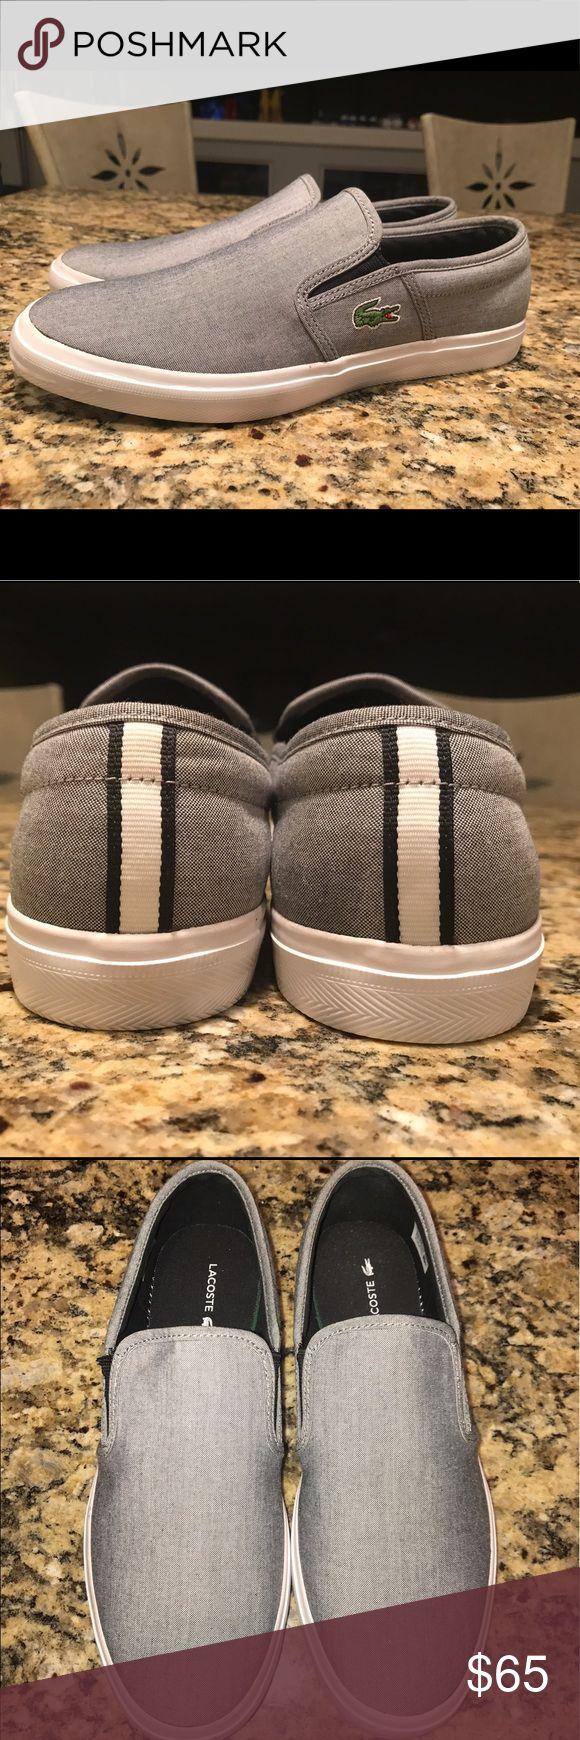 Lacoste Men's Slip-On Comfy men slip-on. Used light. Lacoste Shoes Loafers & Slip-Ons